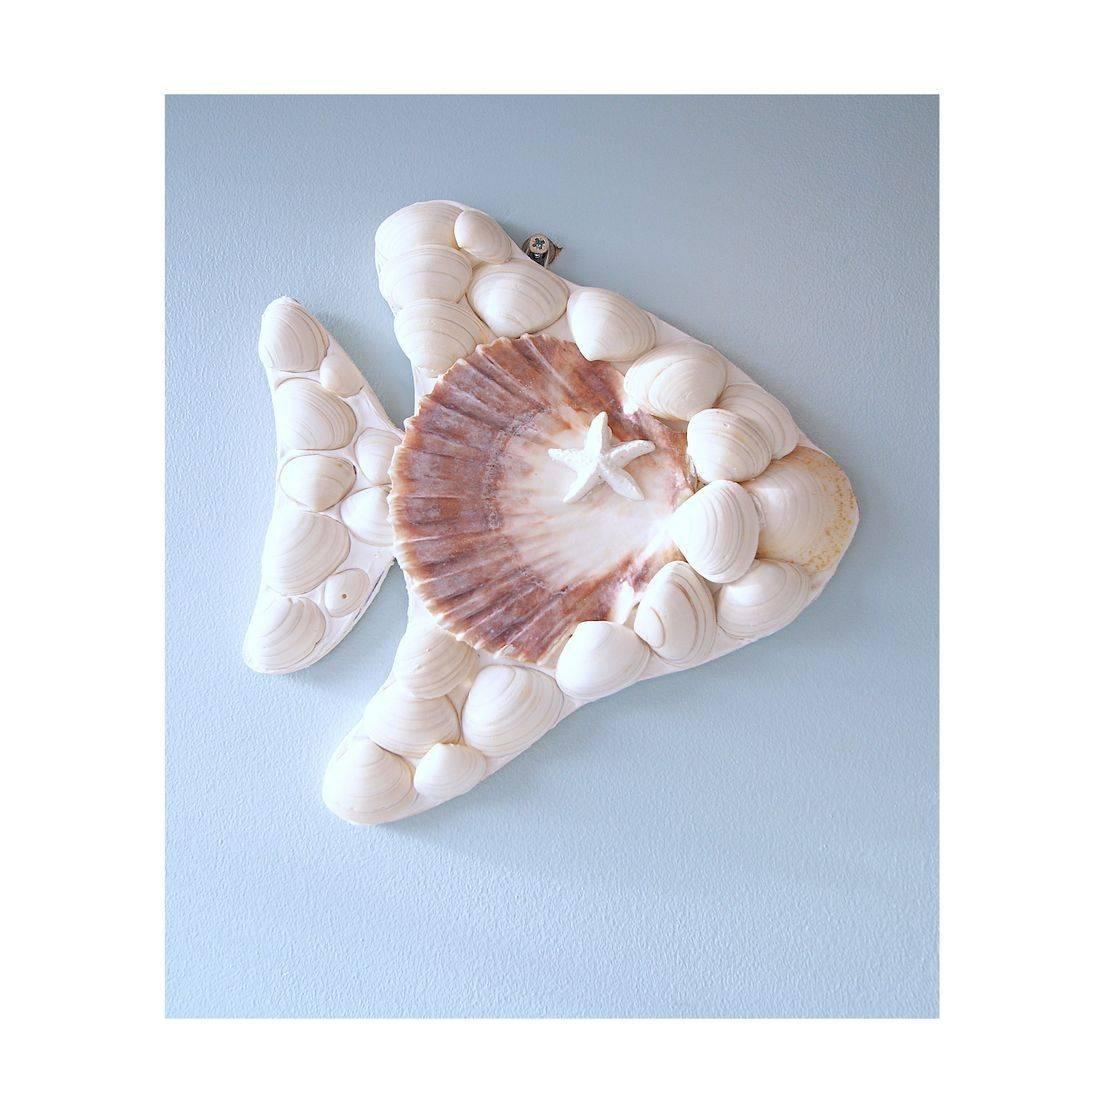 12 Mosaic Shell white fish